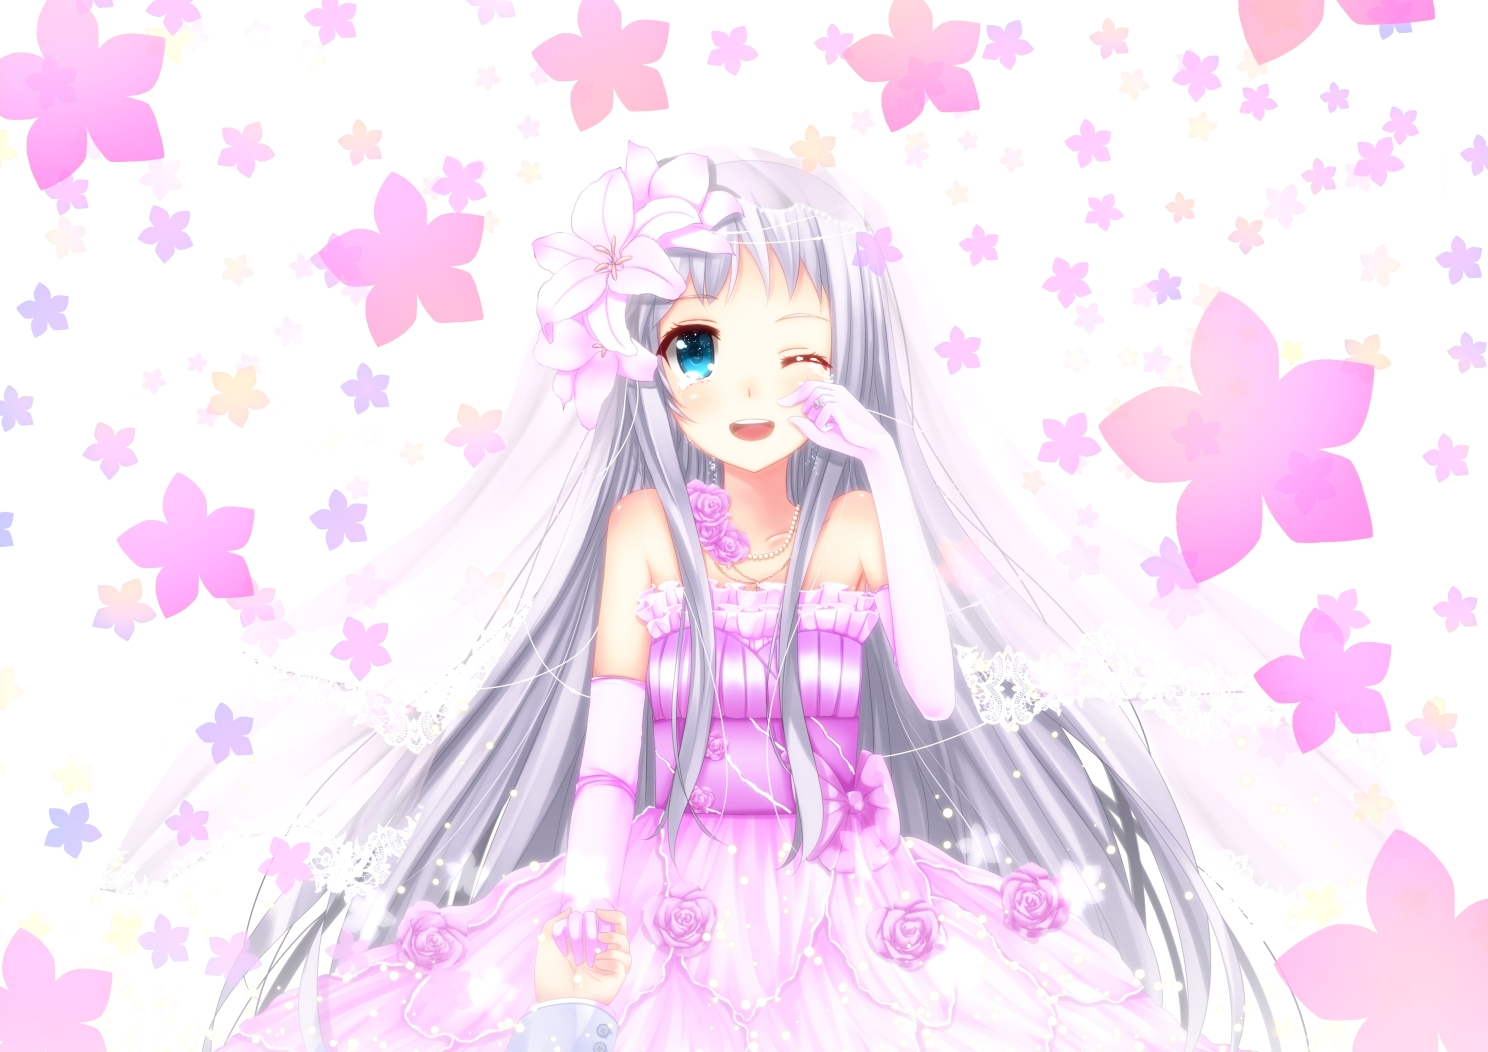 ano_hi_mita_hana_no_namae_wo_bokutachi_wa_mada_shiranai blue_eyes blush crying flowers gray_hair honma_meiko long_hair swordsouls wedding wedding_attire